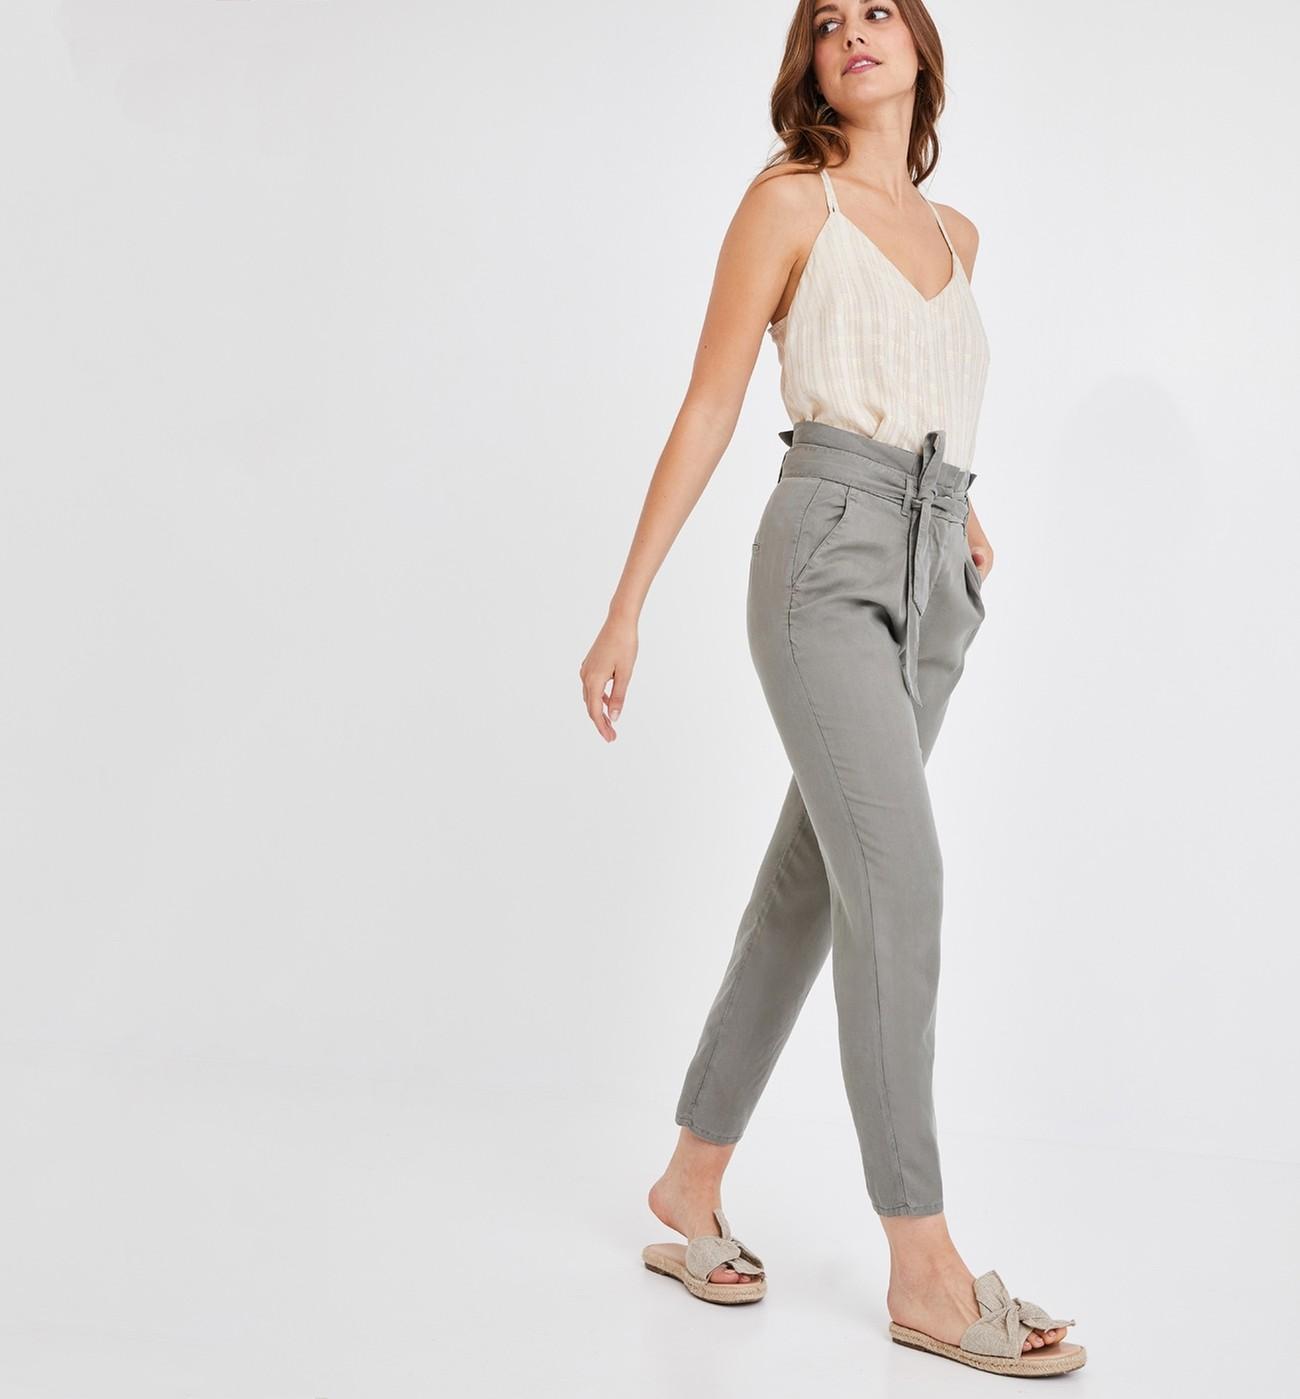 Paper Bag Pantalon Femme Promod bf7YvmI6gy